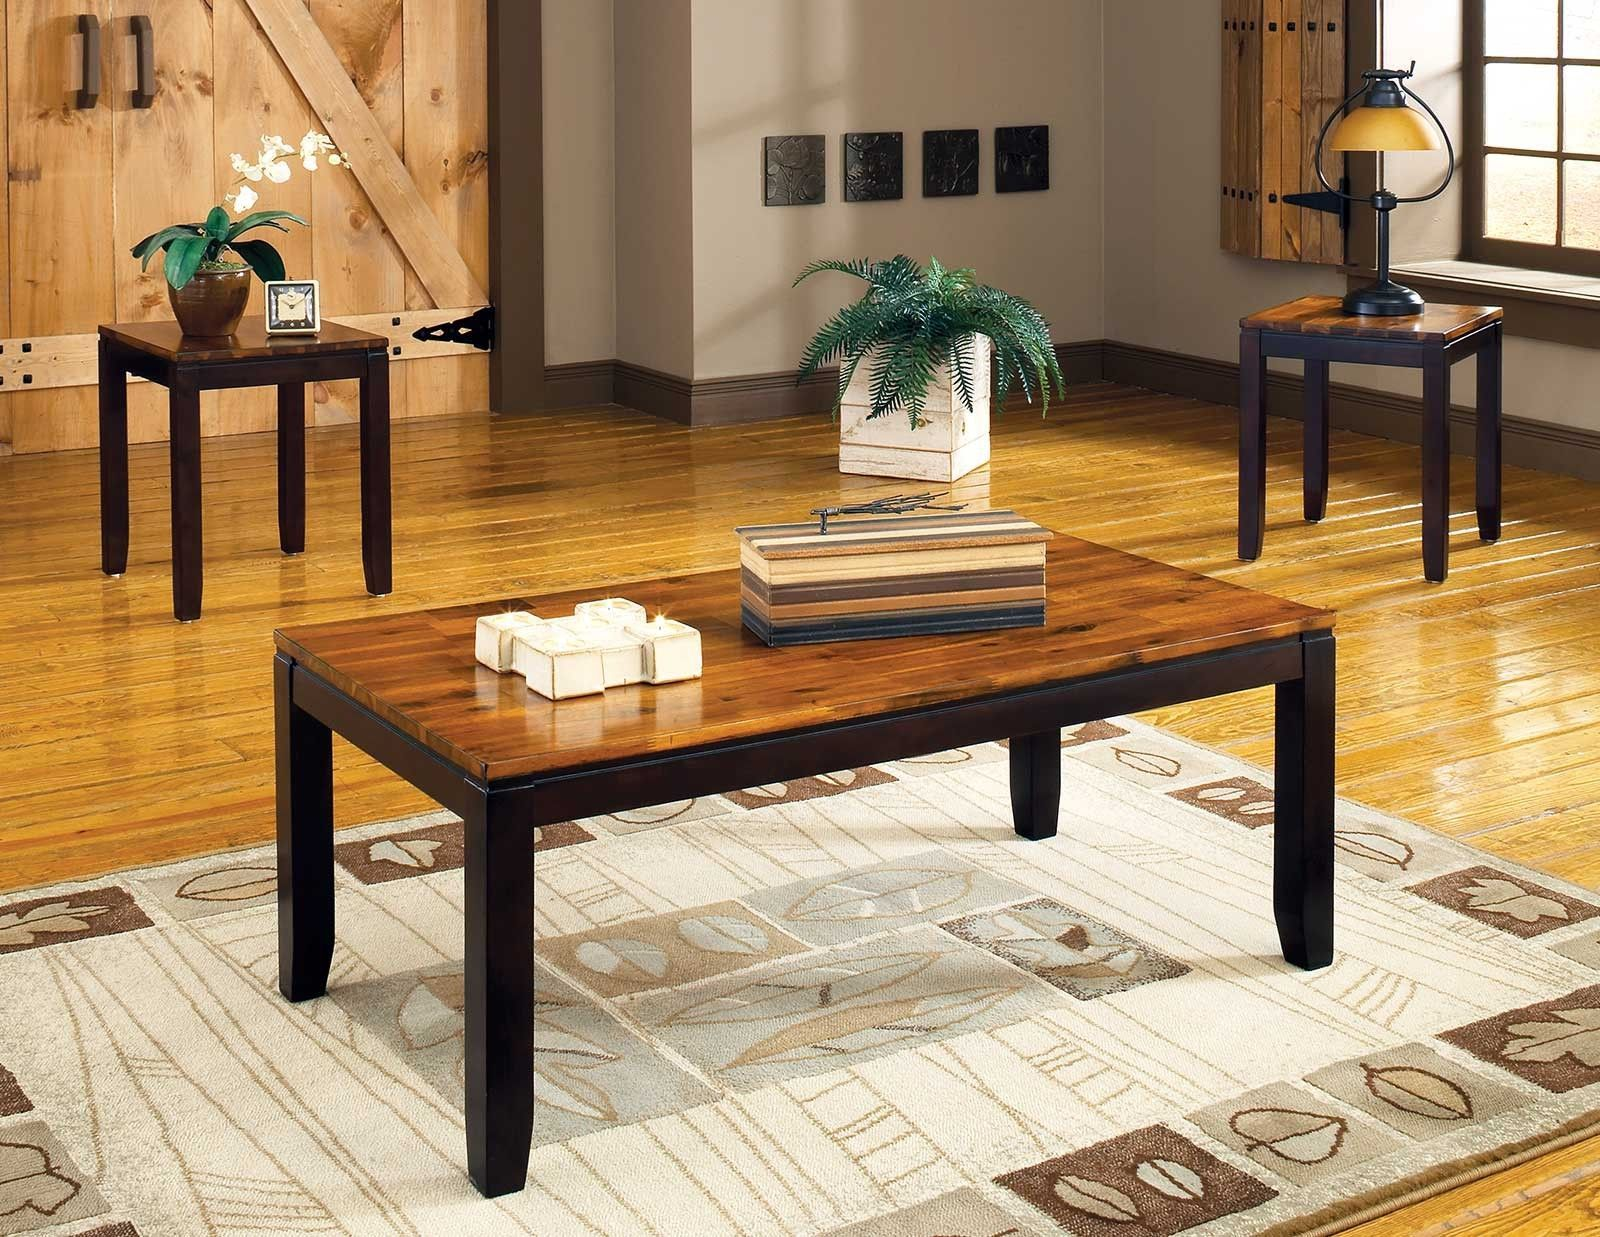 Designer 3 Piece Table Set Living Room Table Sets 3 Piece Coffee Table Set Coffee Table [ 1237 x 1600 Pixel ]